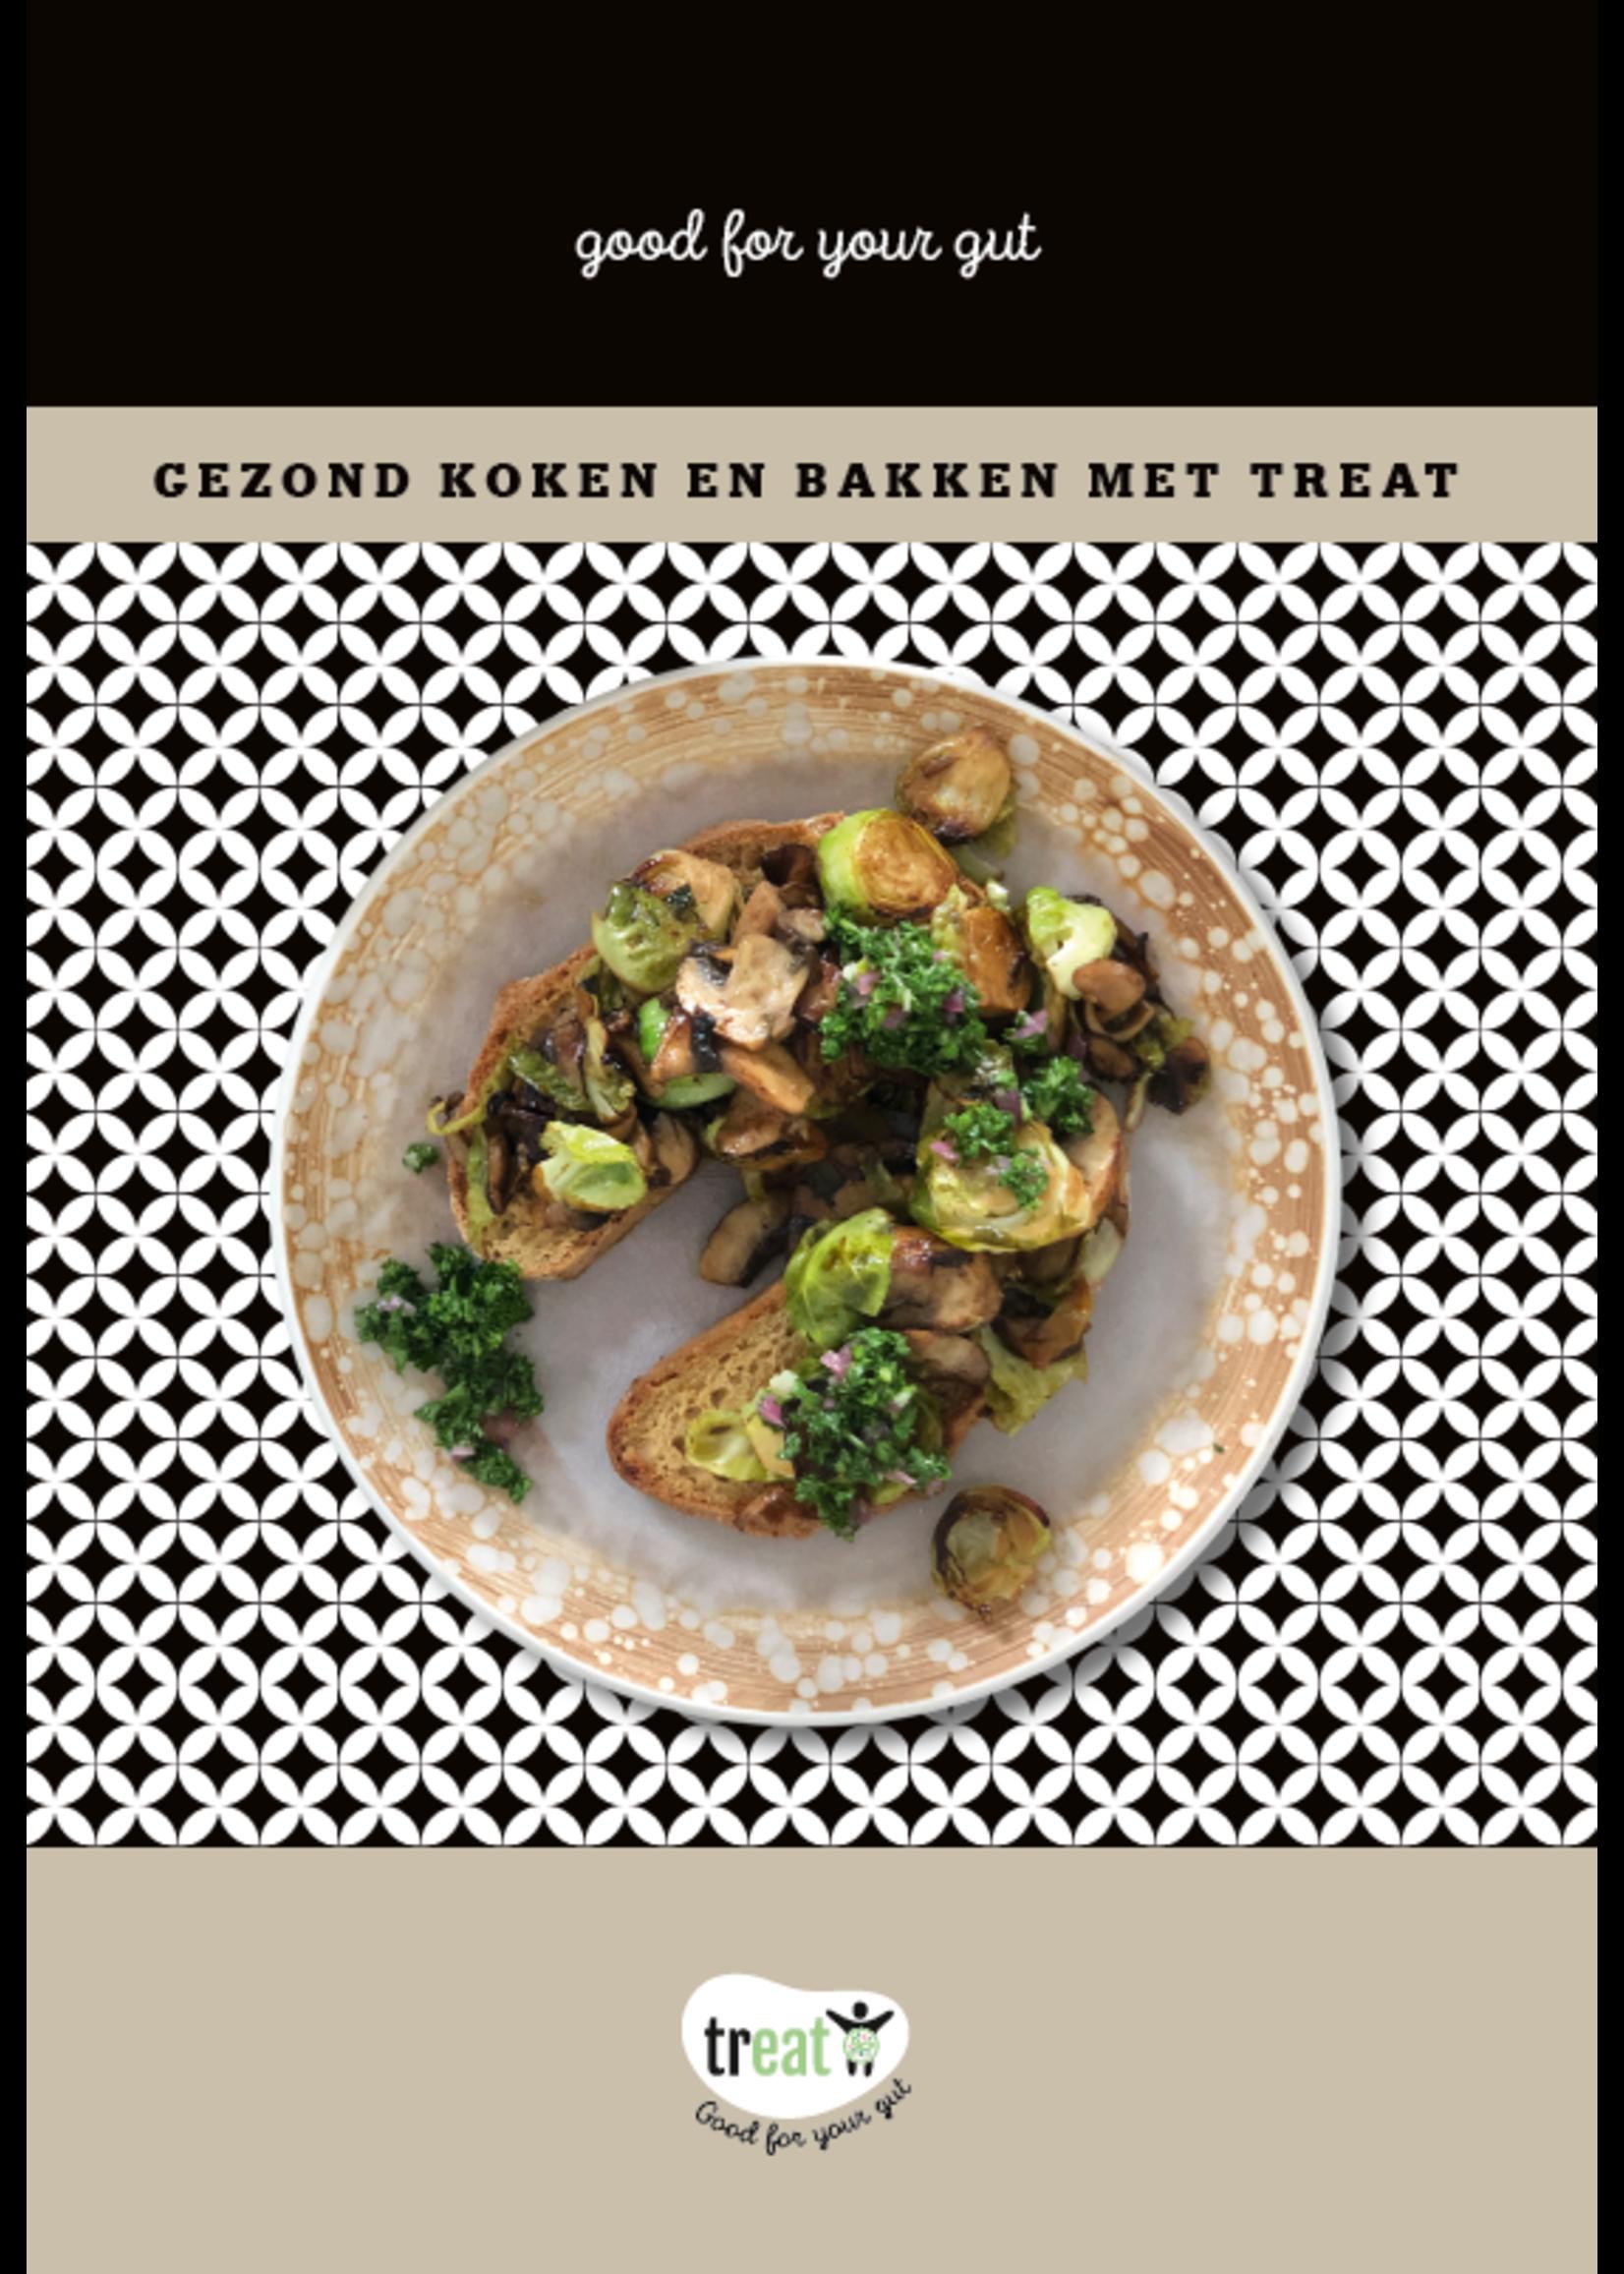 Tr-eat Good for your gut boek Tr-eat